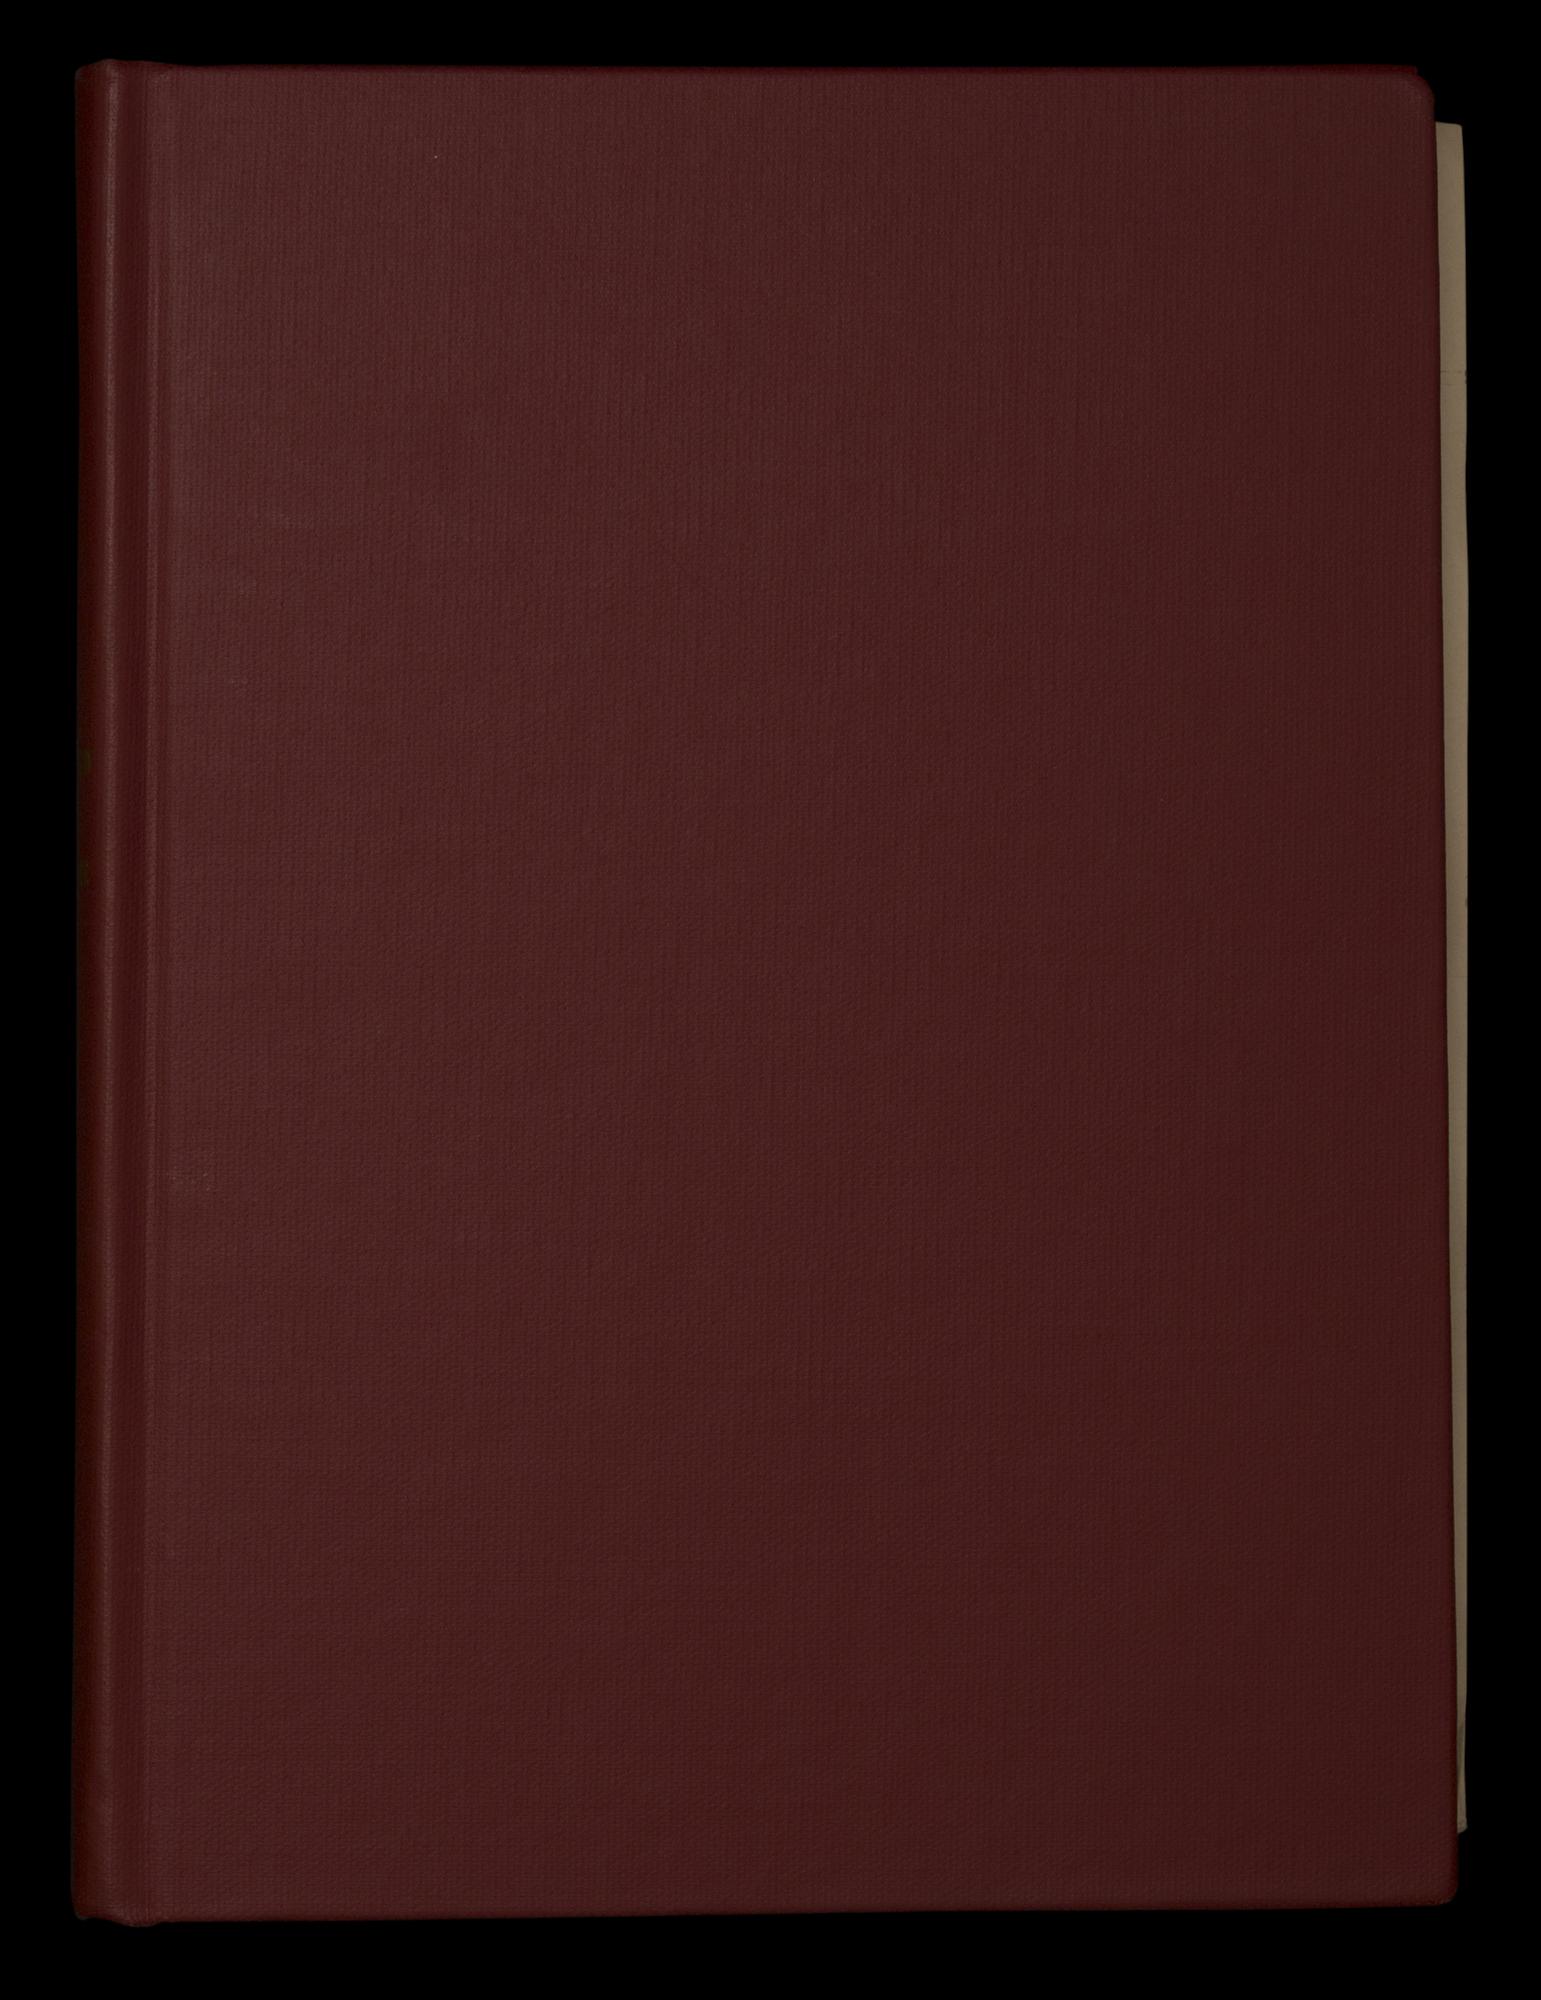 HB_ProgramBook_Cover_1971.jpg